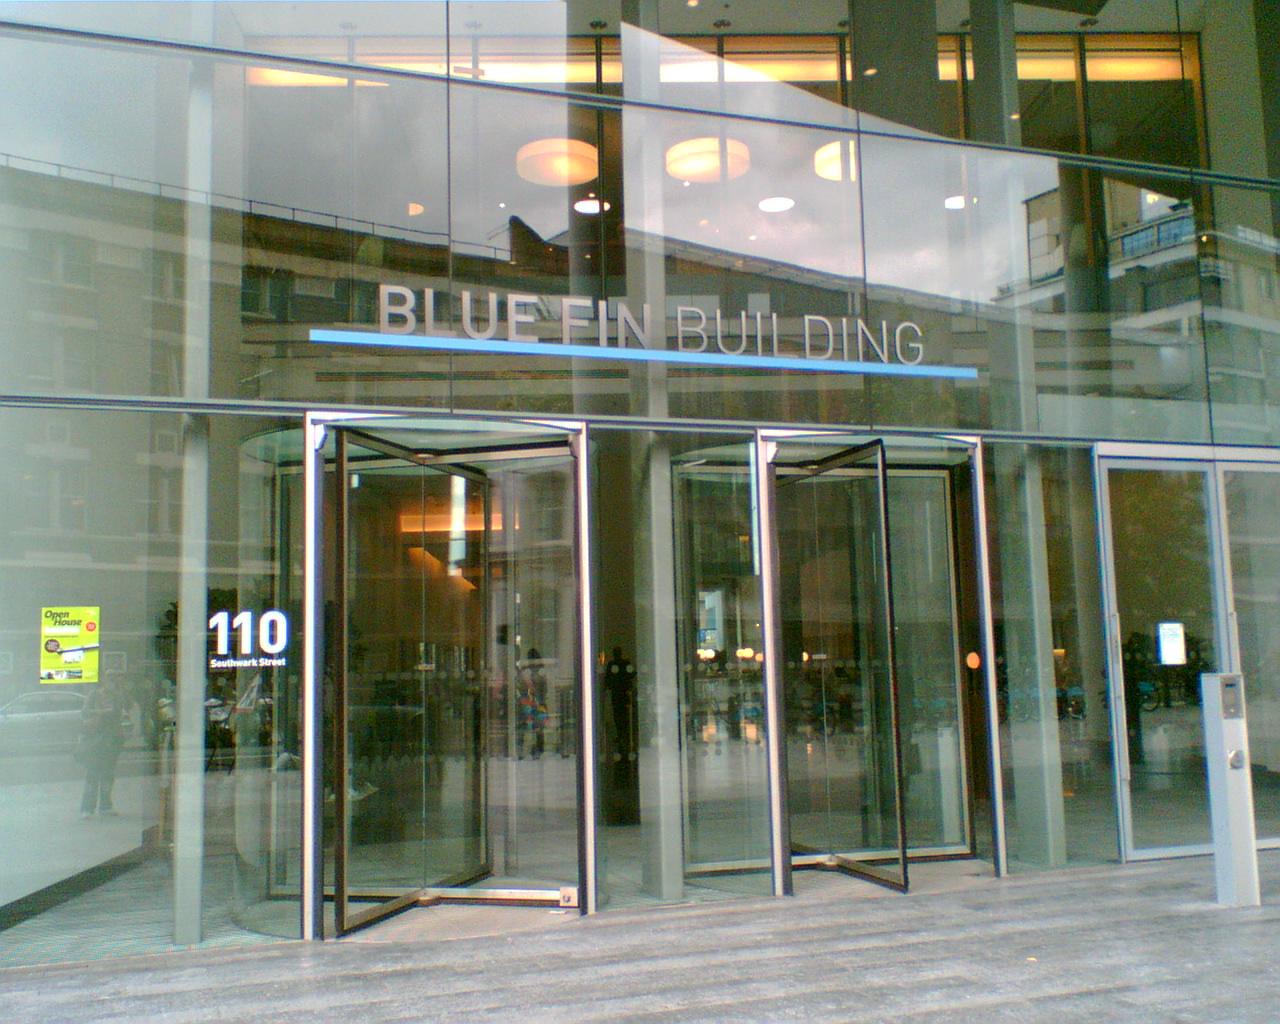 http://1.bp.blogspot.com/_LqD0oGoPmM0/TJzoYvuxJiI/AAAAAAAAA24/eKwpzcxi7v4/s1600/blue+fin+building_1.jpg